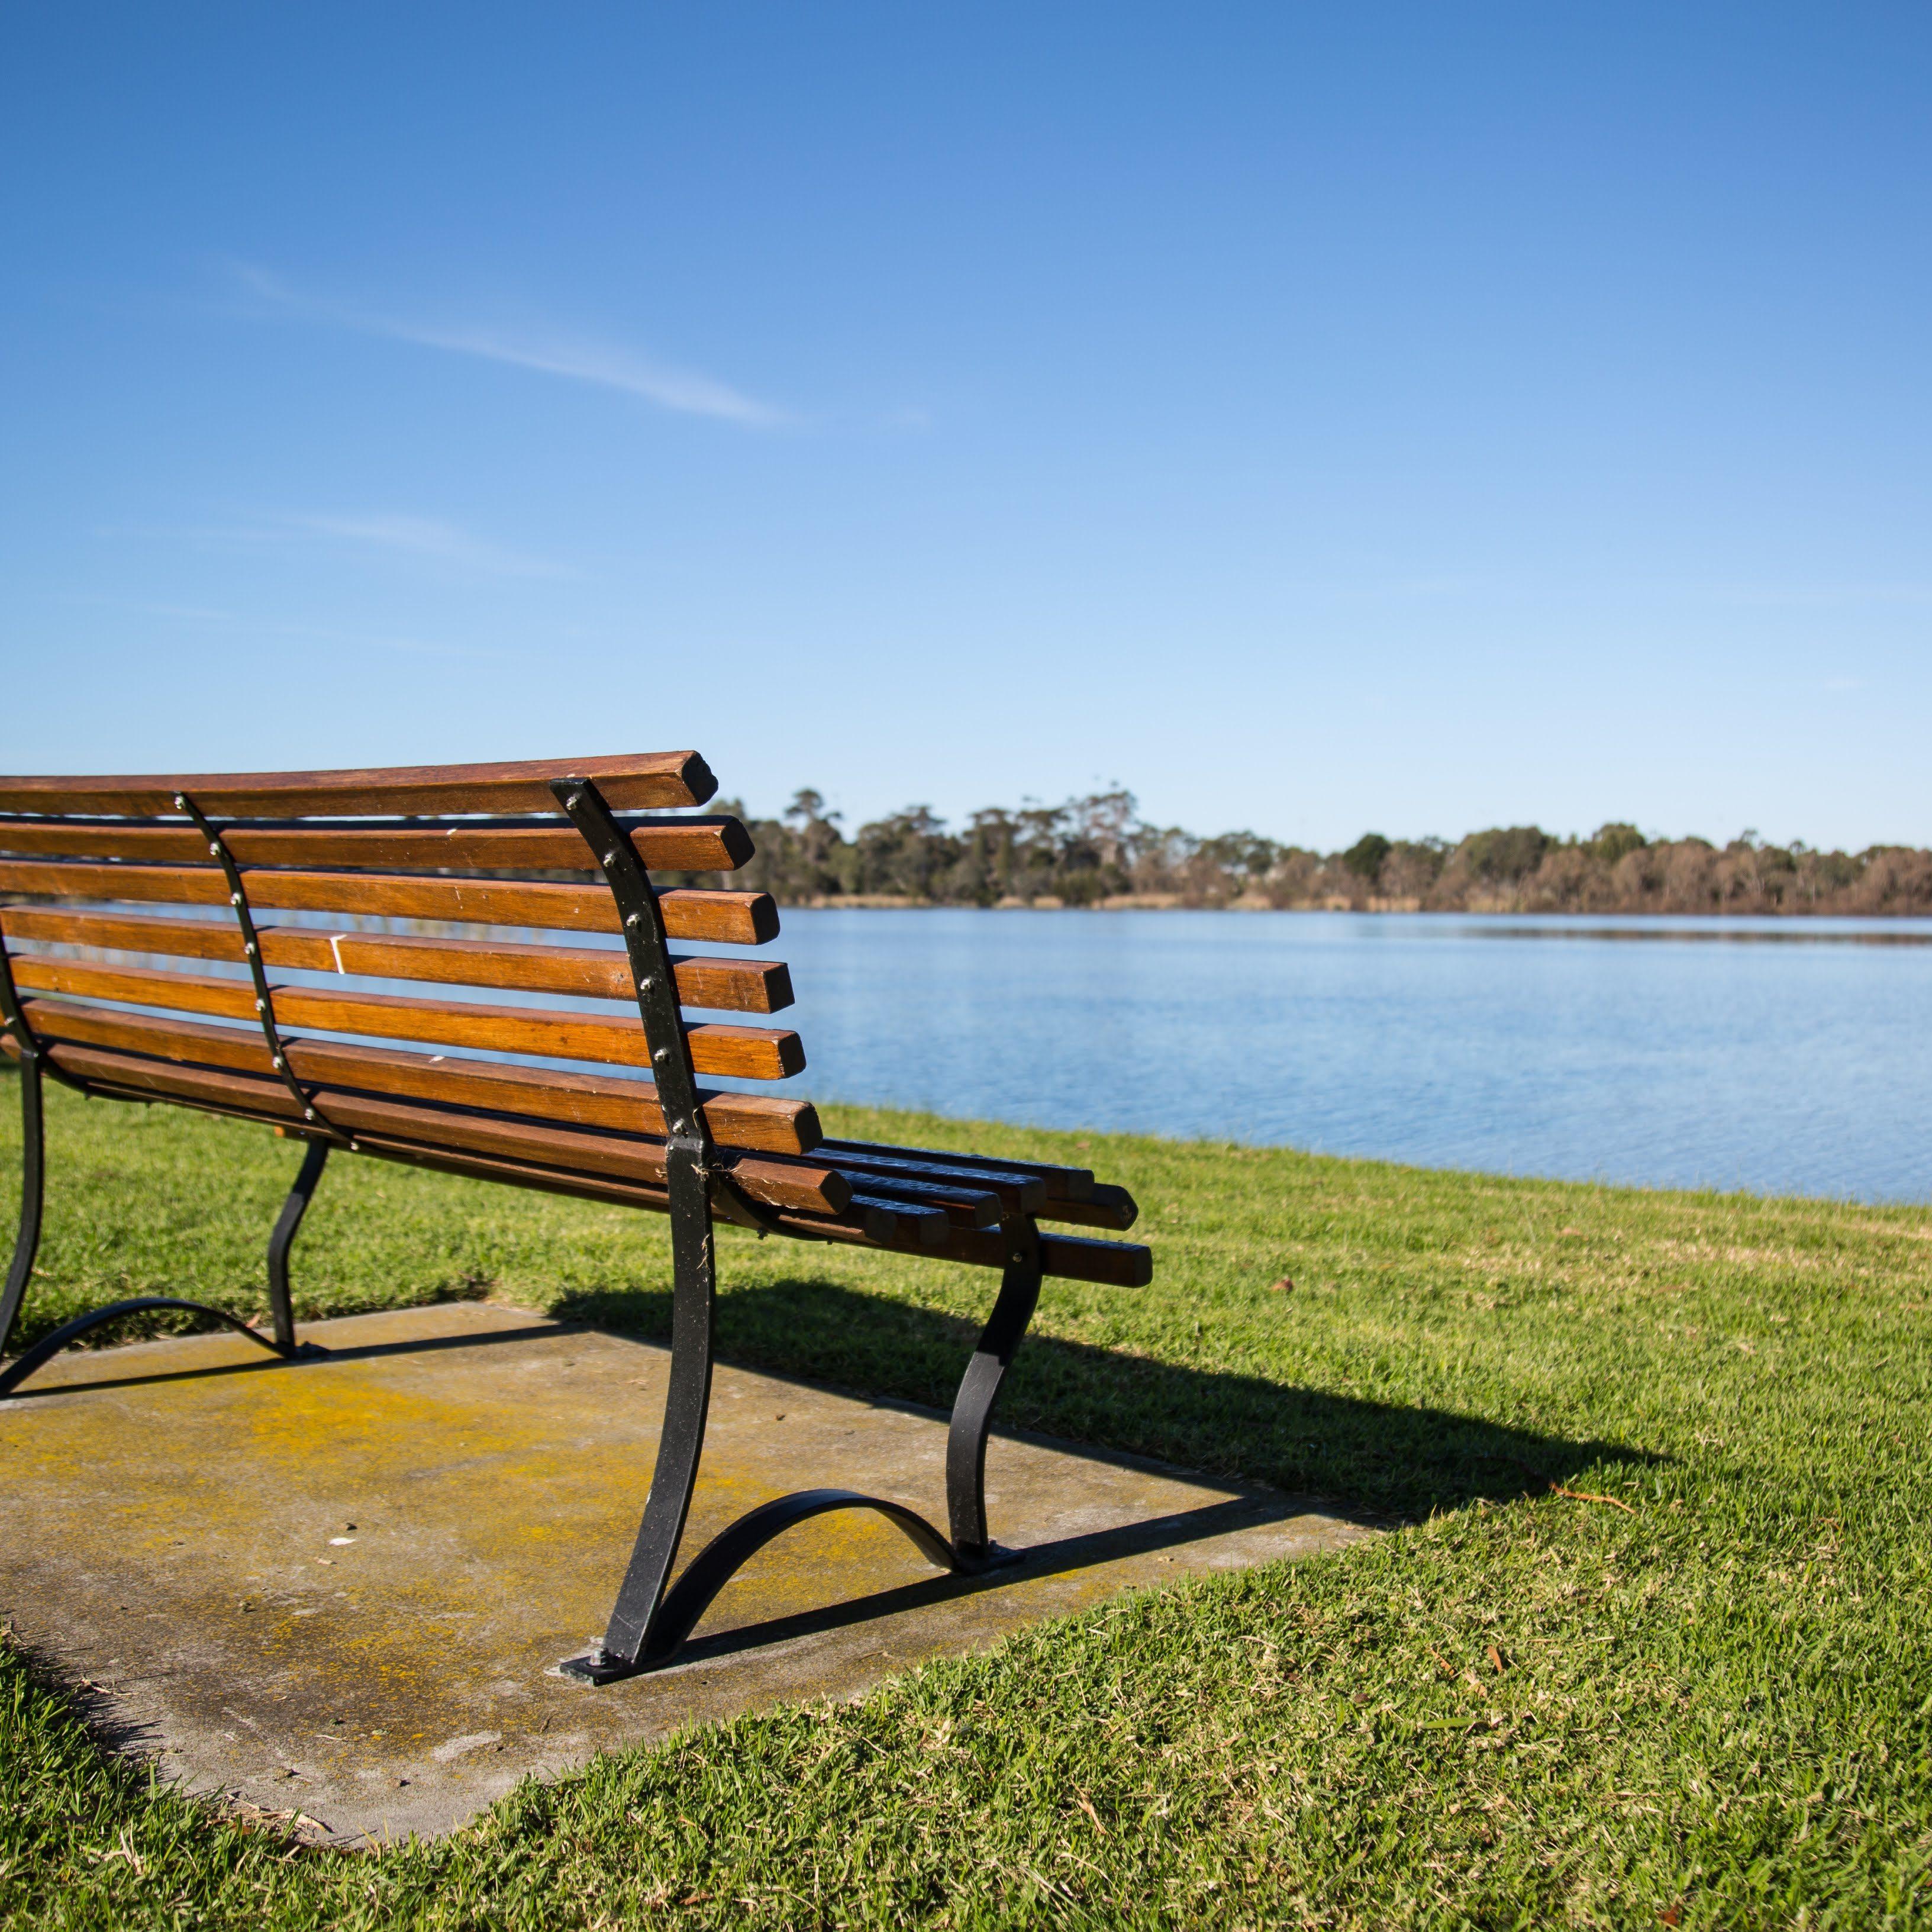 GROW Gippsland - Park Bench By Lake